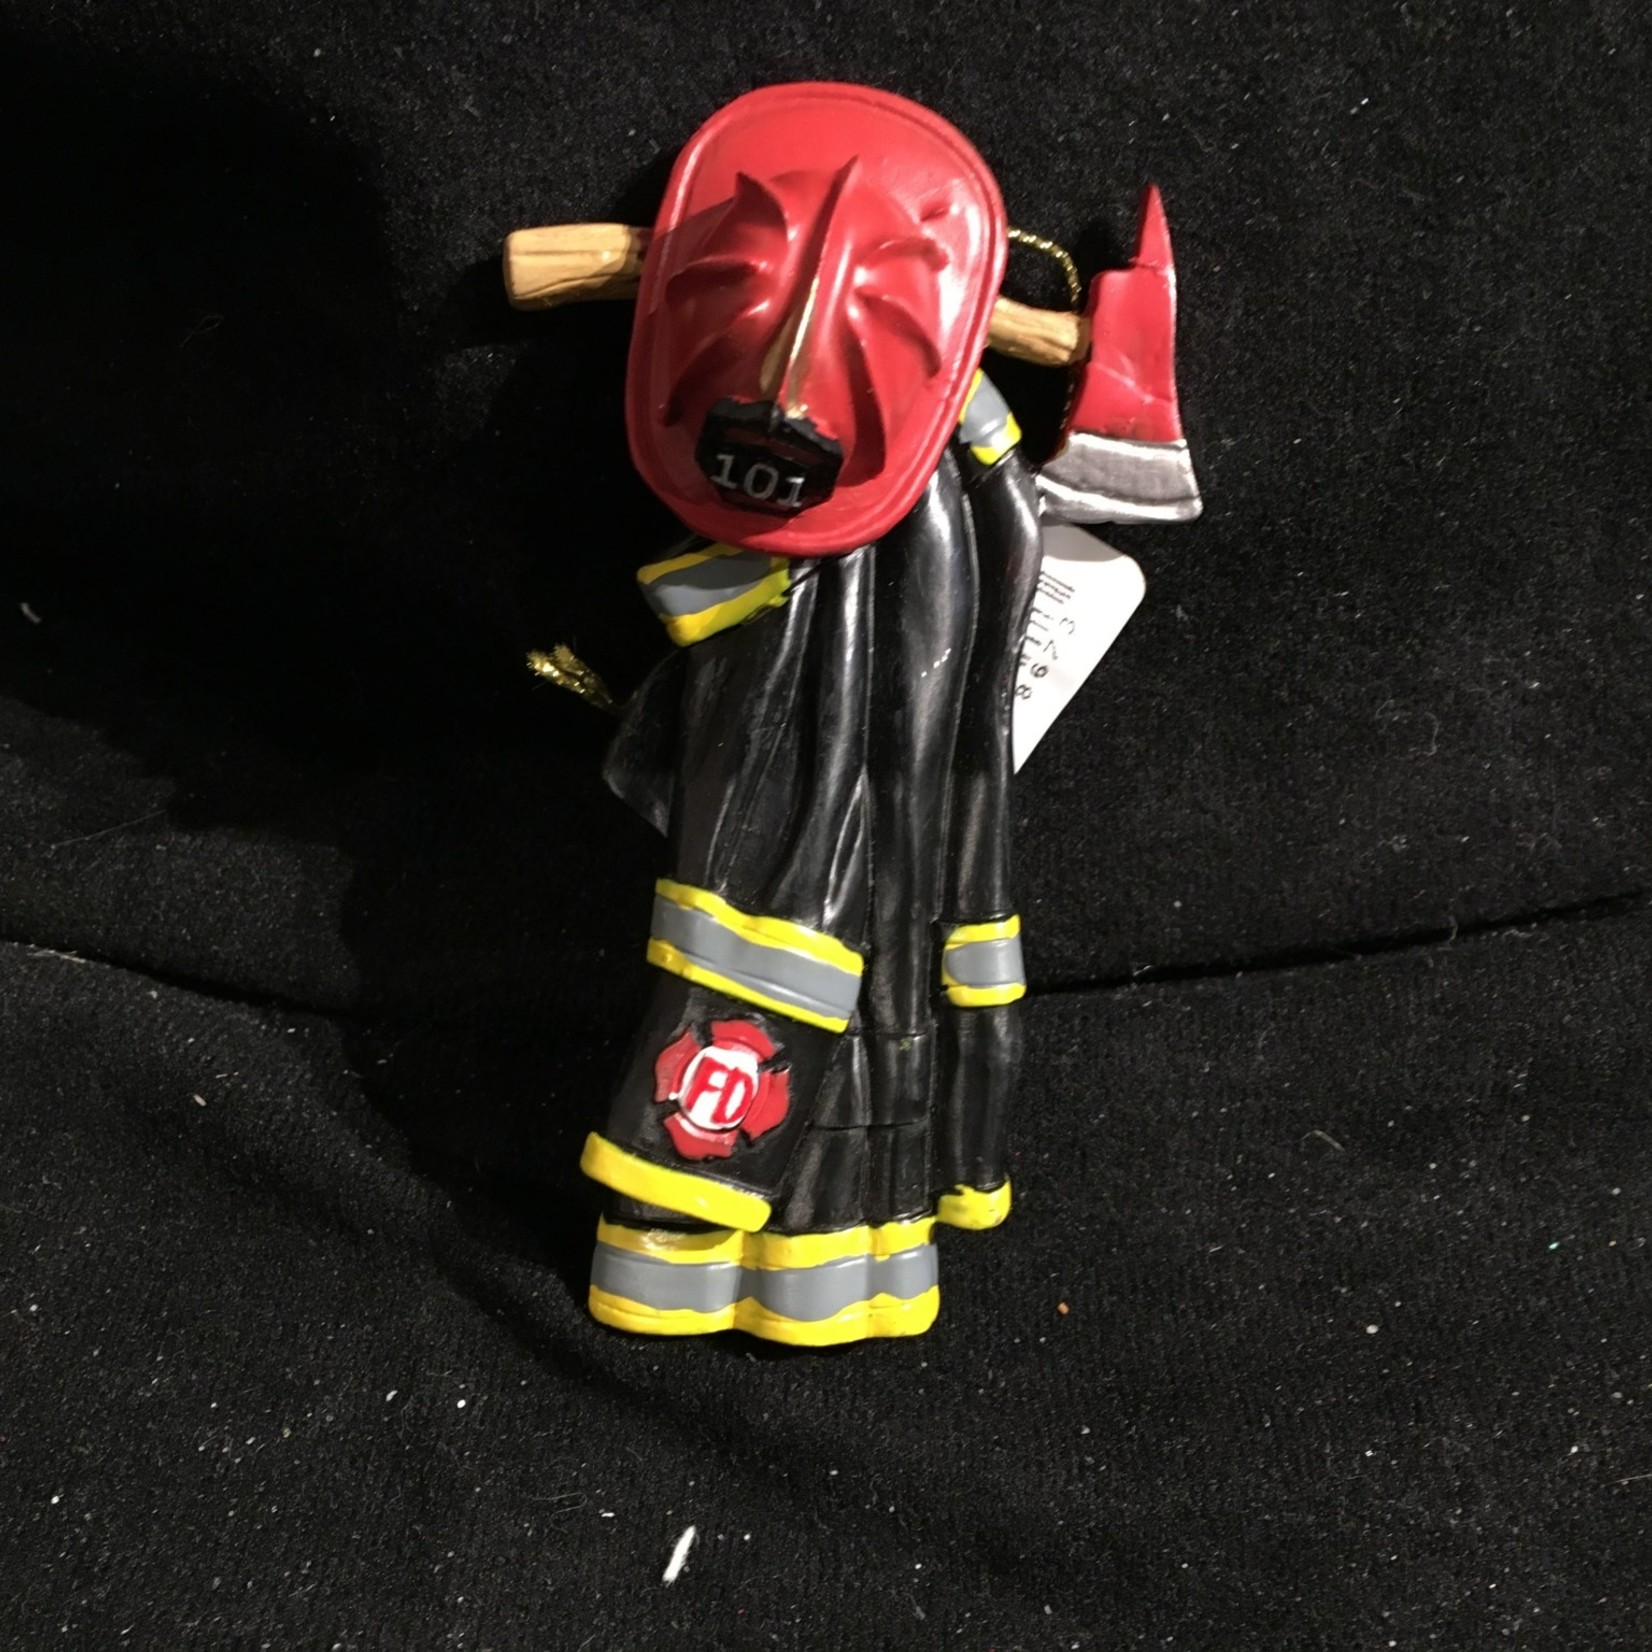 Firefighter Uniform Orn